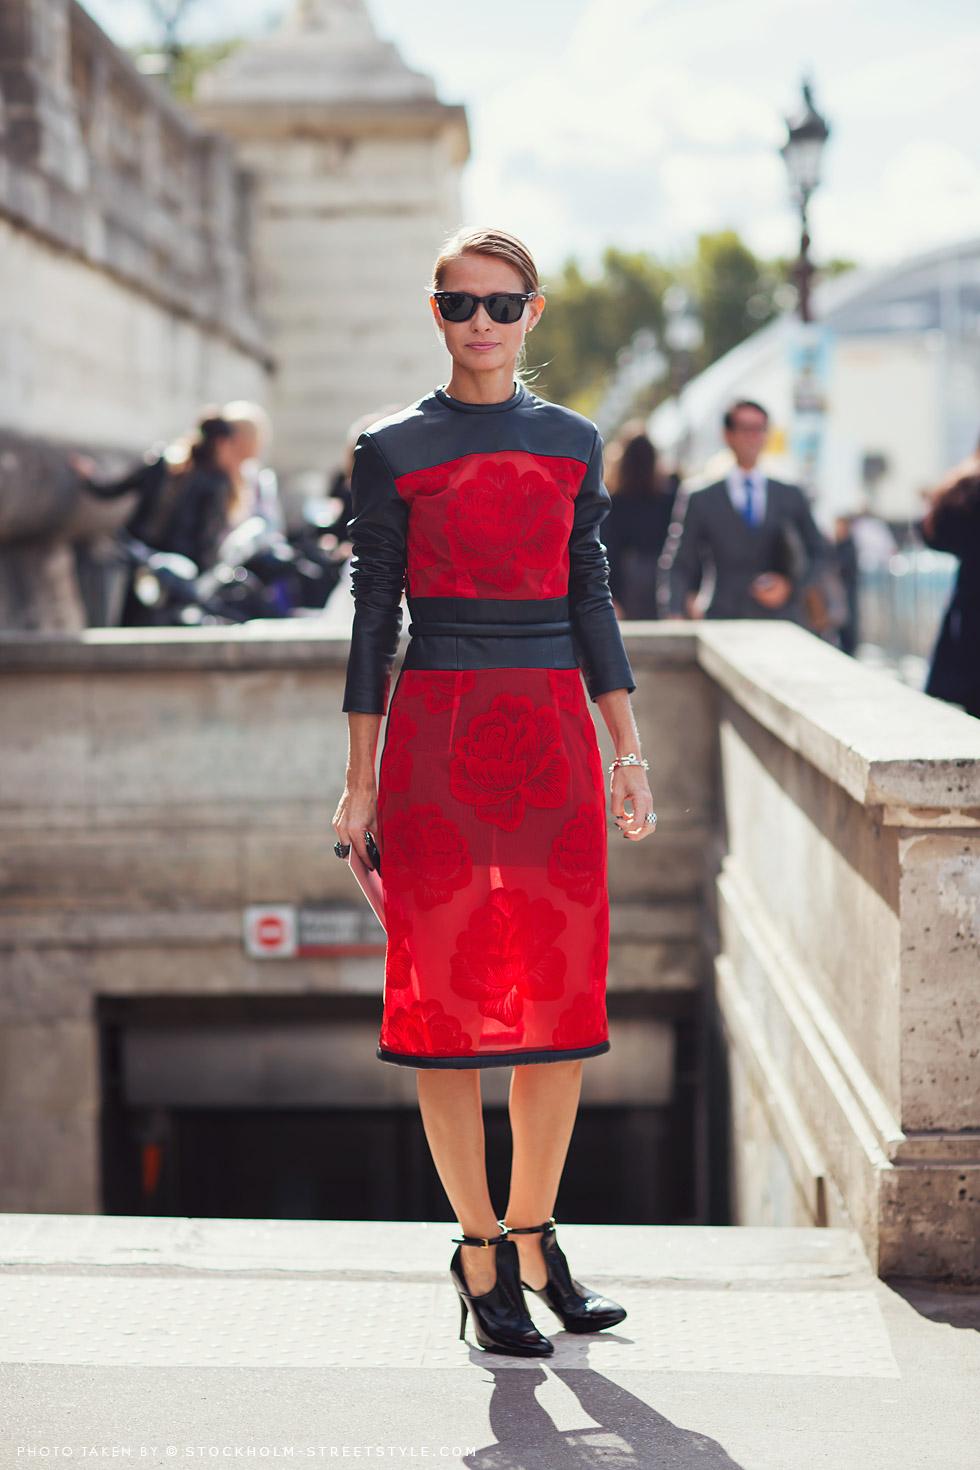 How To Dress For An Oscar Party Lauren Messiah